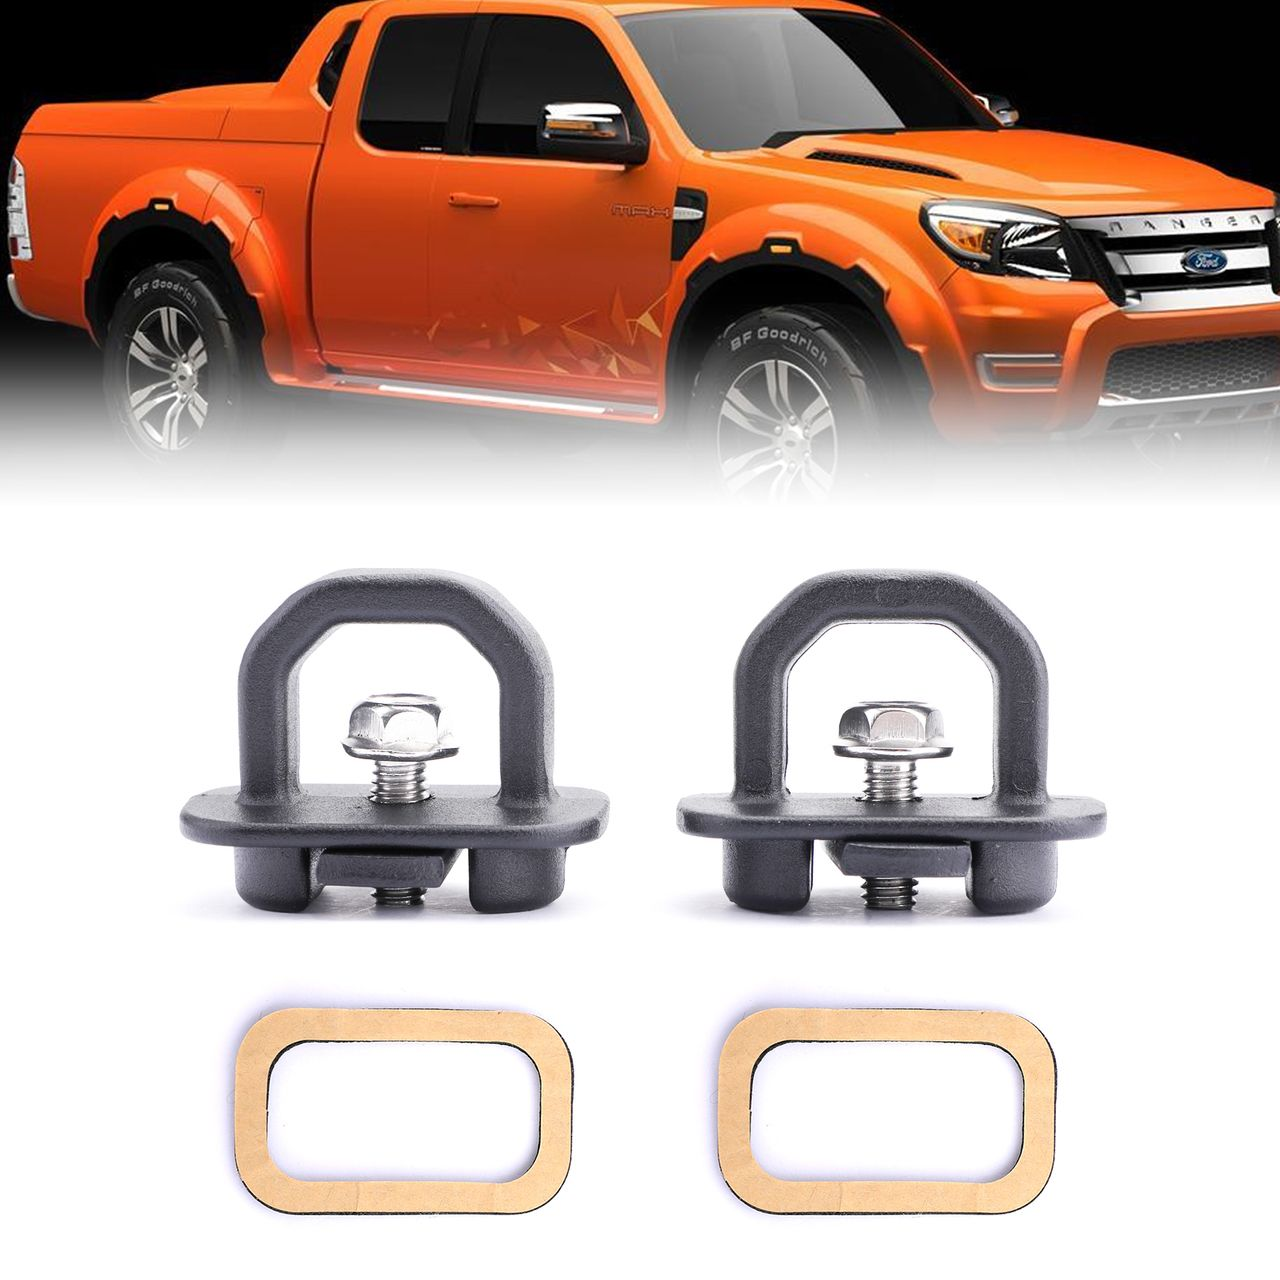 Pin On Car Truck Motor Vehicle Parts